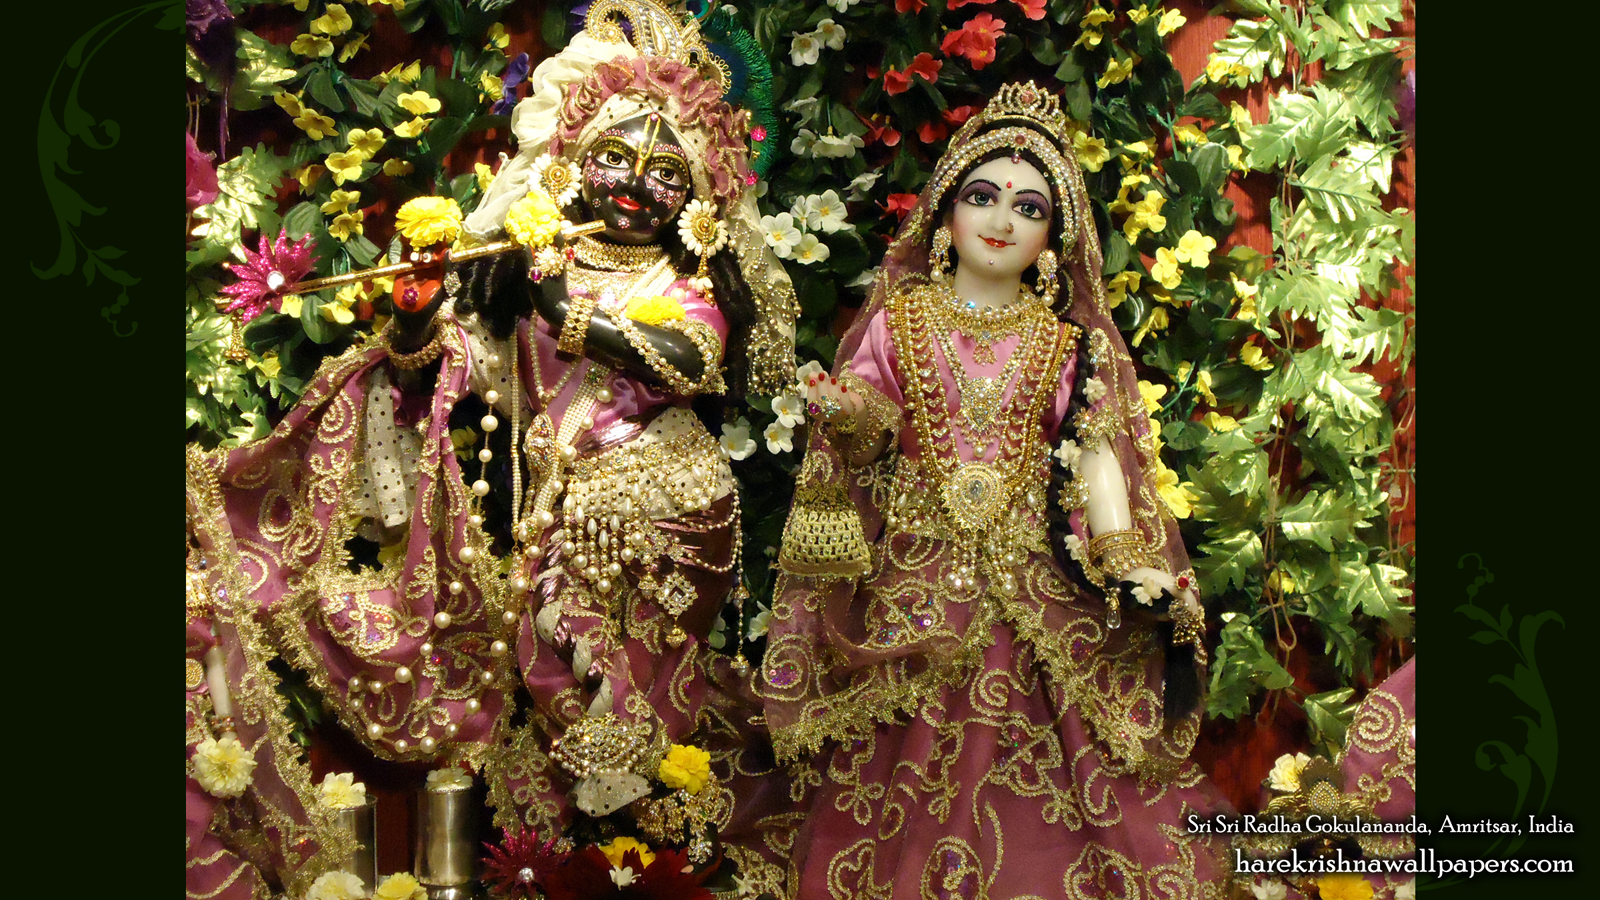 Sri Sri Radha Gokulananda Wallpaper (003) Size 1600x900 Download